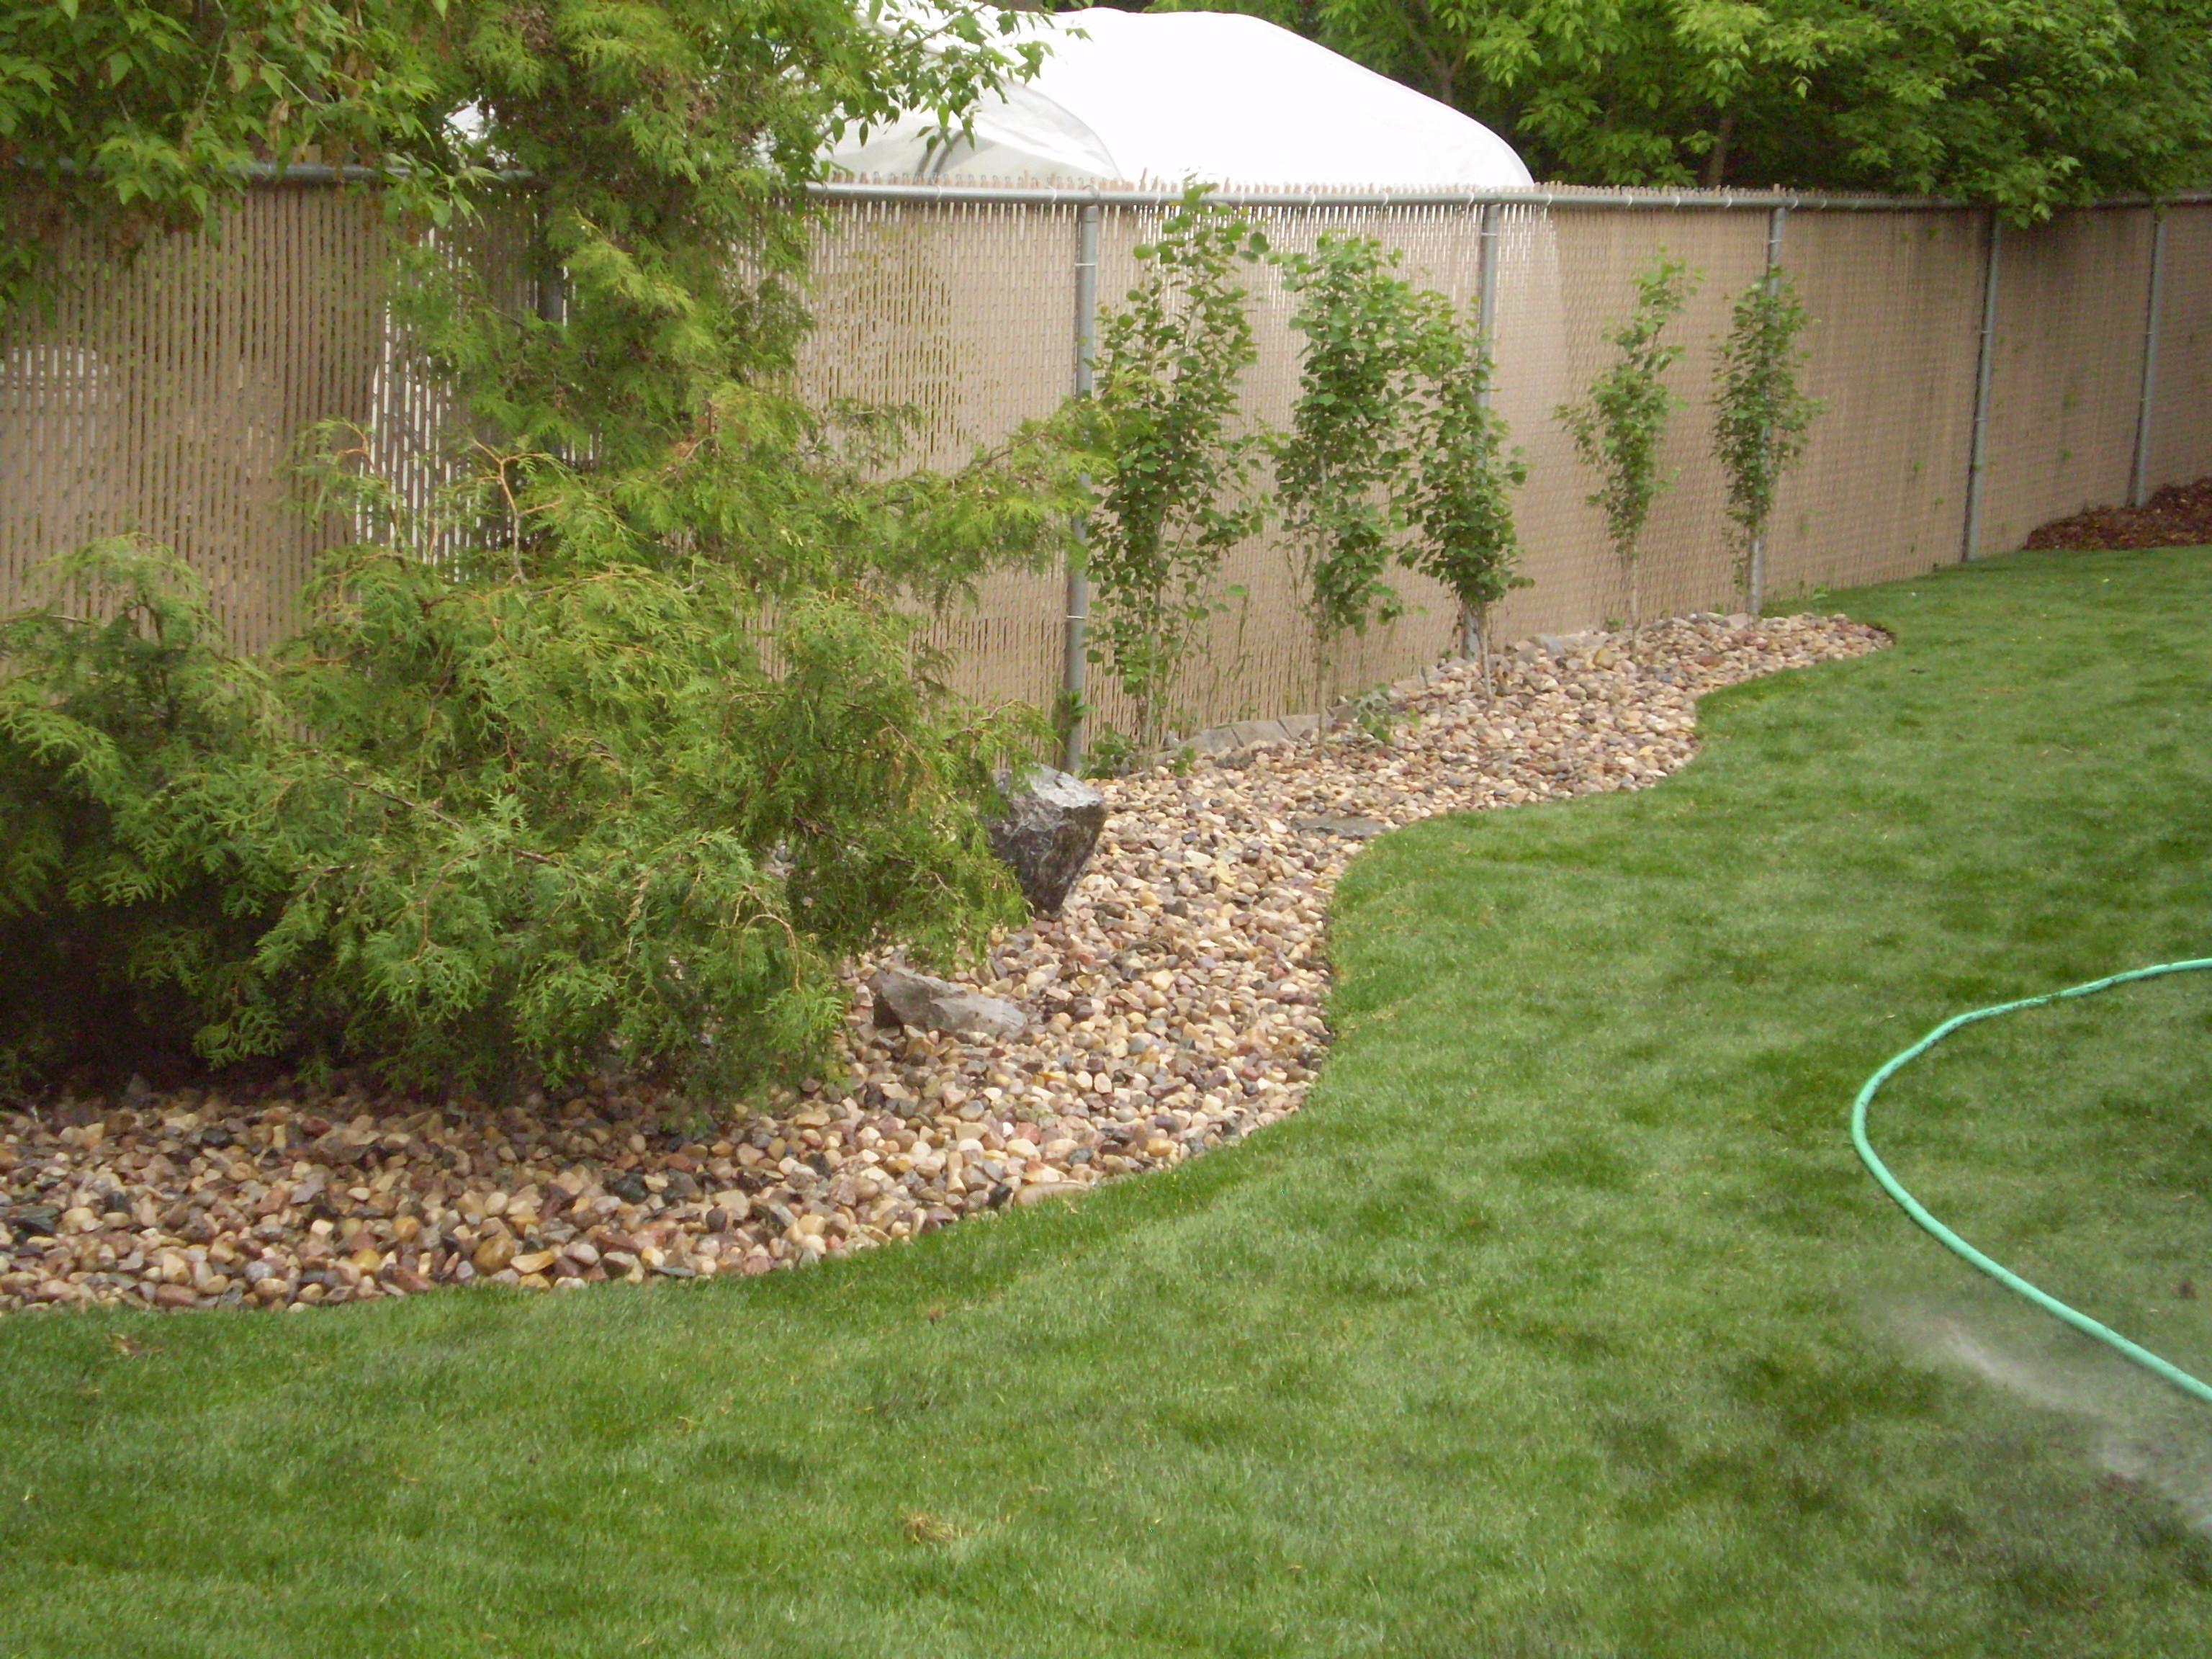 Landscaping Plans Edmonton : Landscaping backyard ideas edmonton